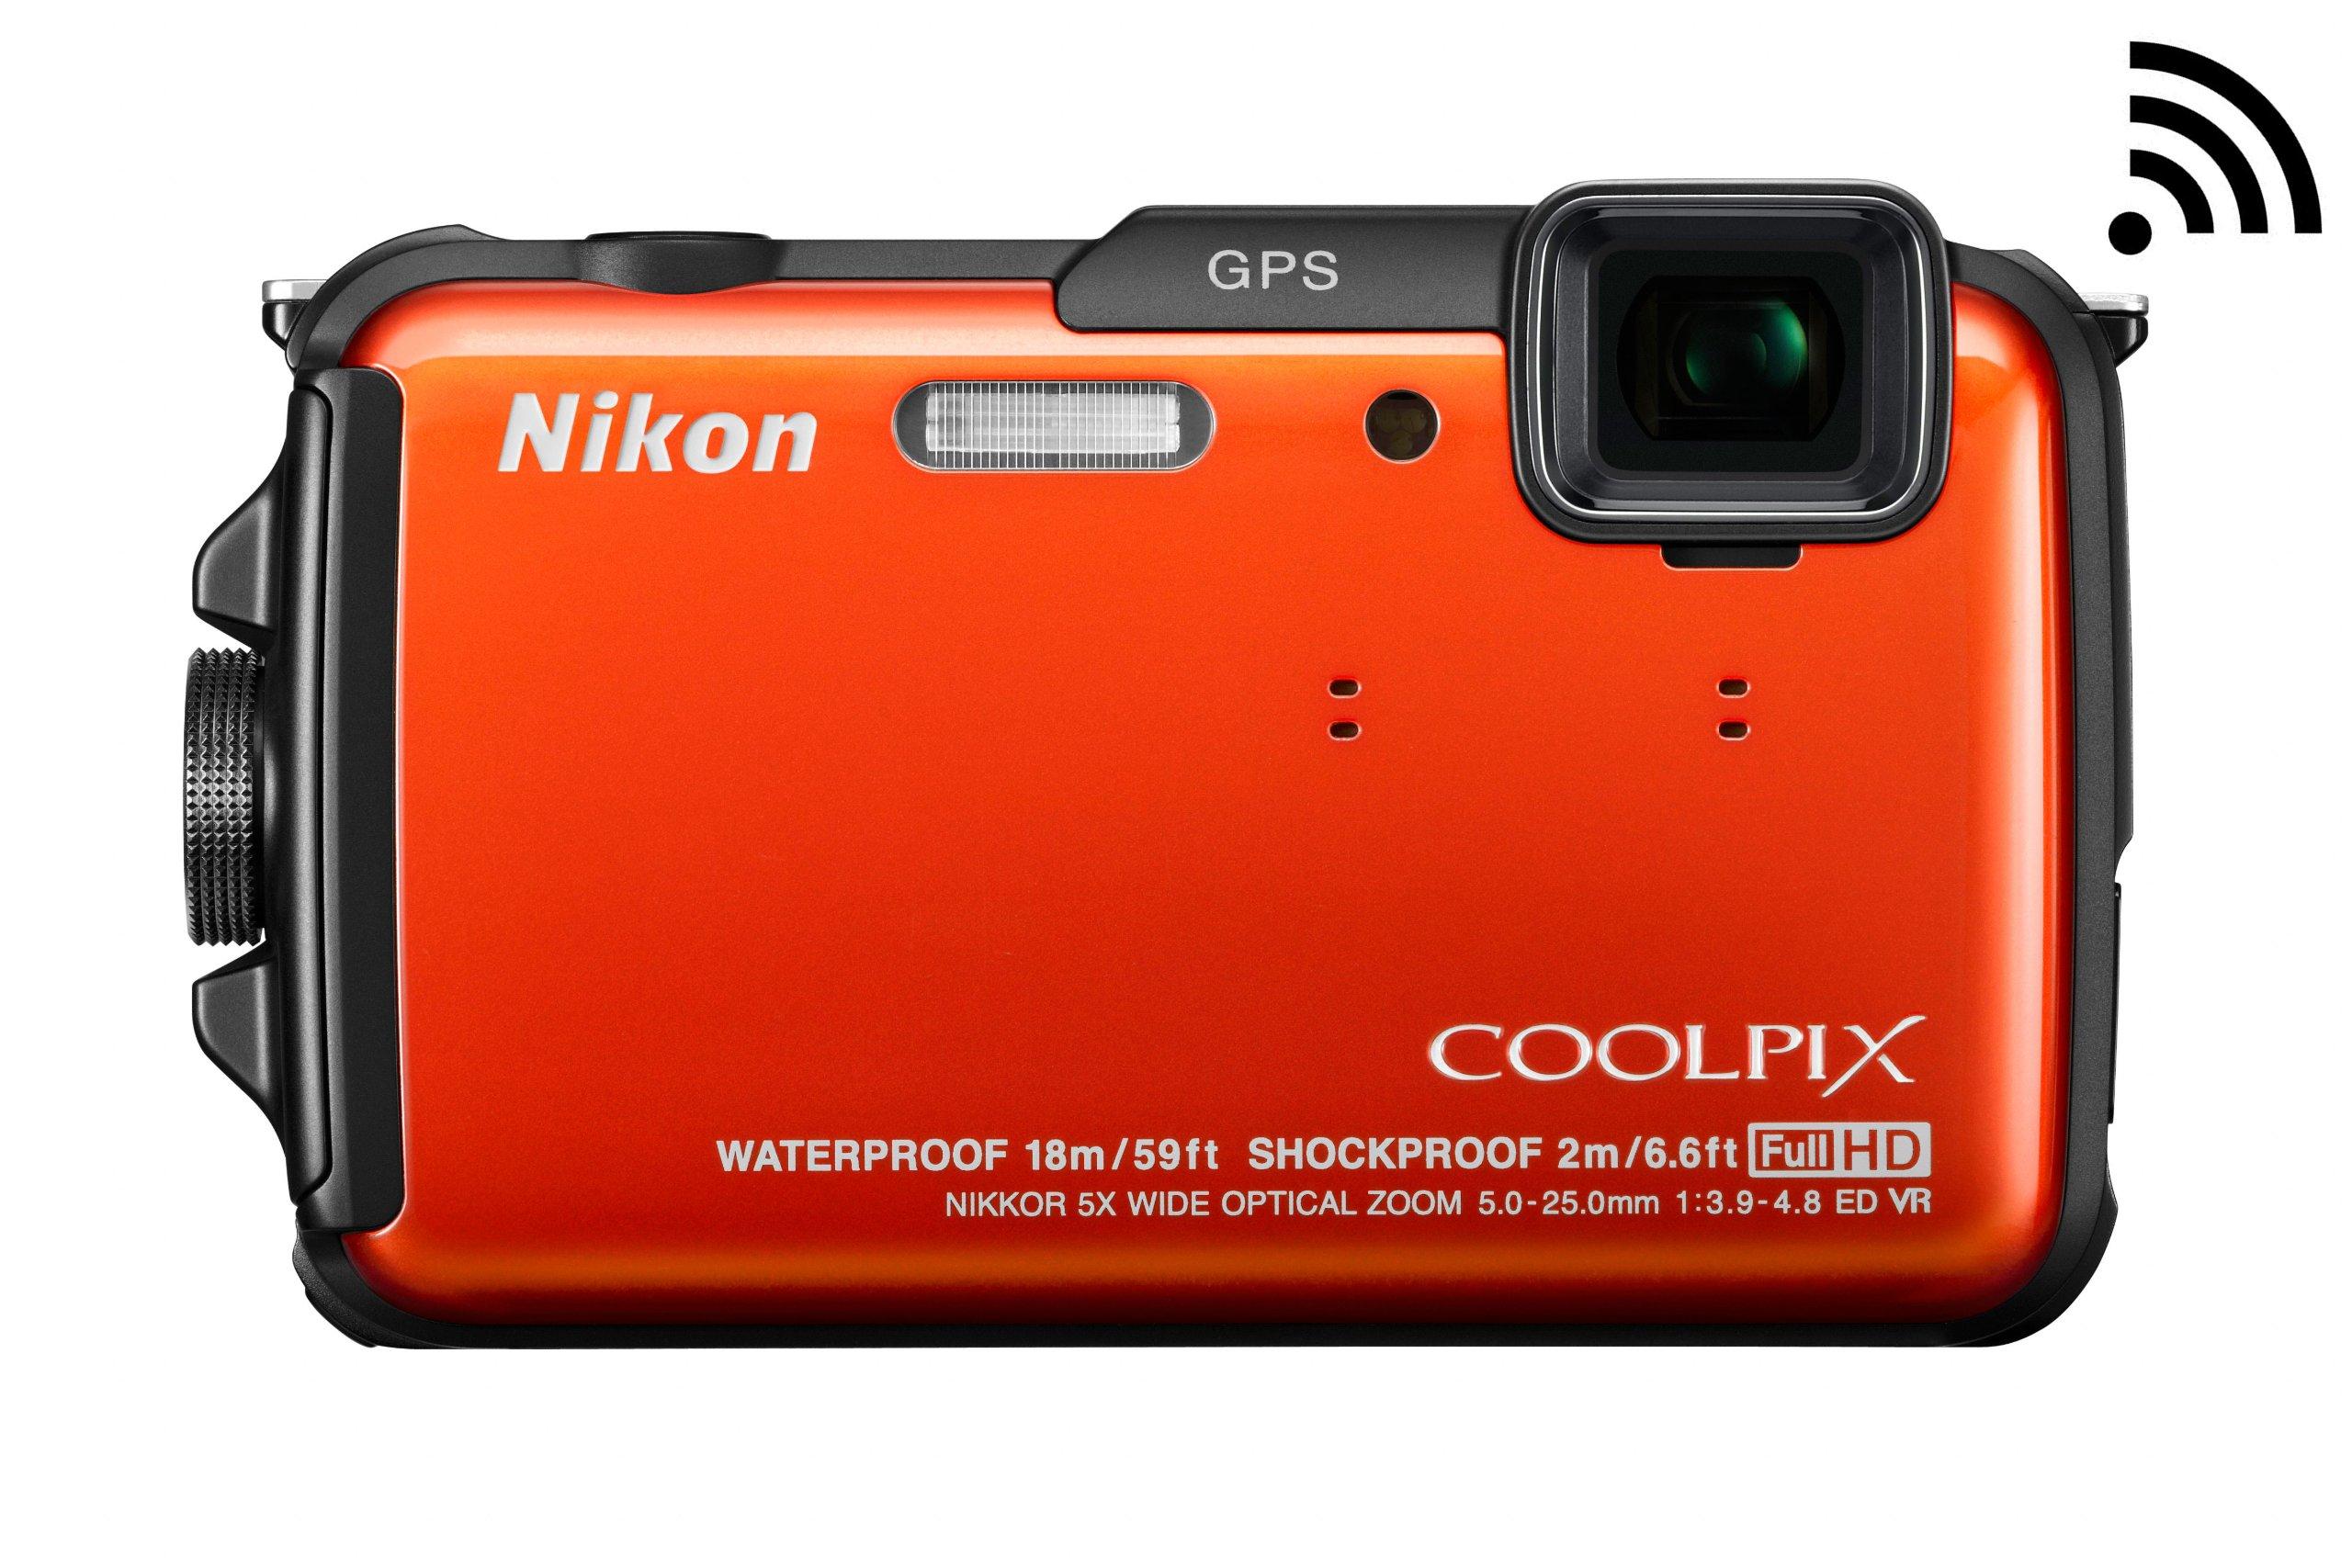 Nikon COOLPIX AW110 Wi-Fi and Waterproof Digital Camera with GPS (Orange) (OLD MODEL) by Nikon